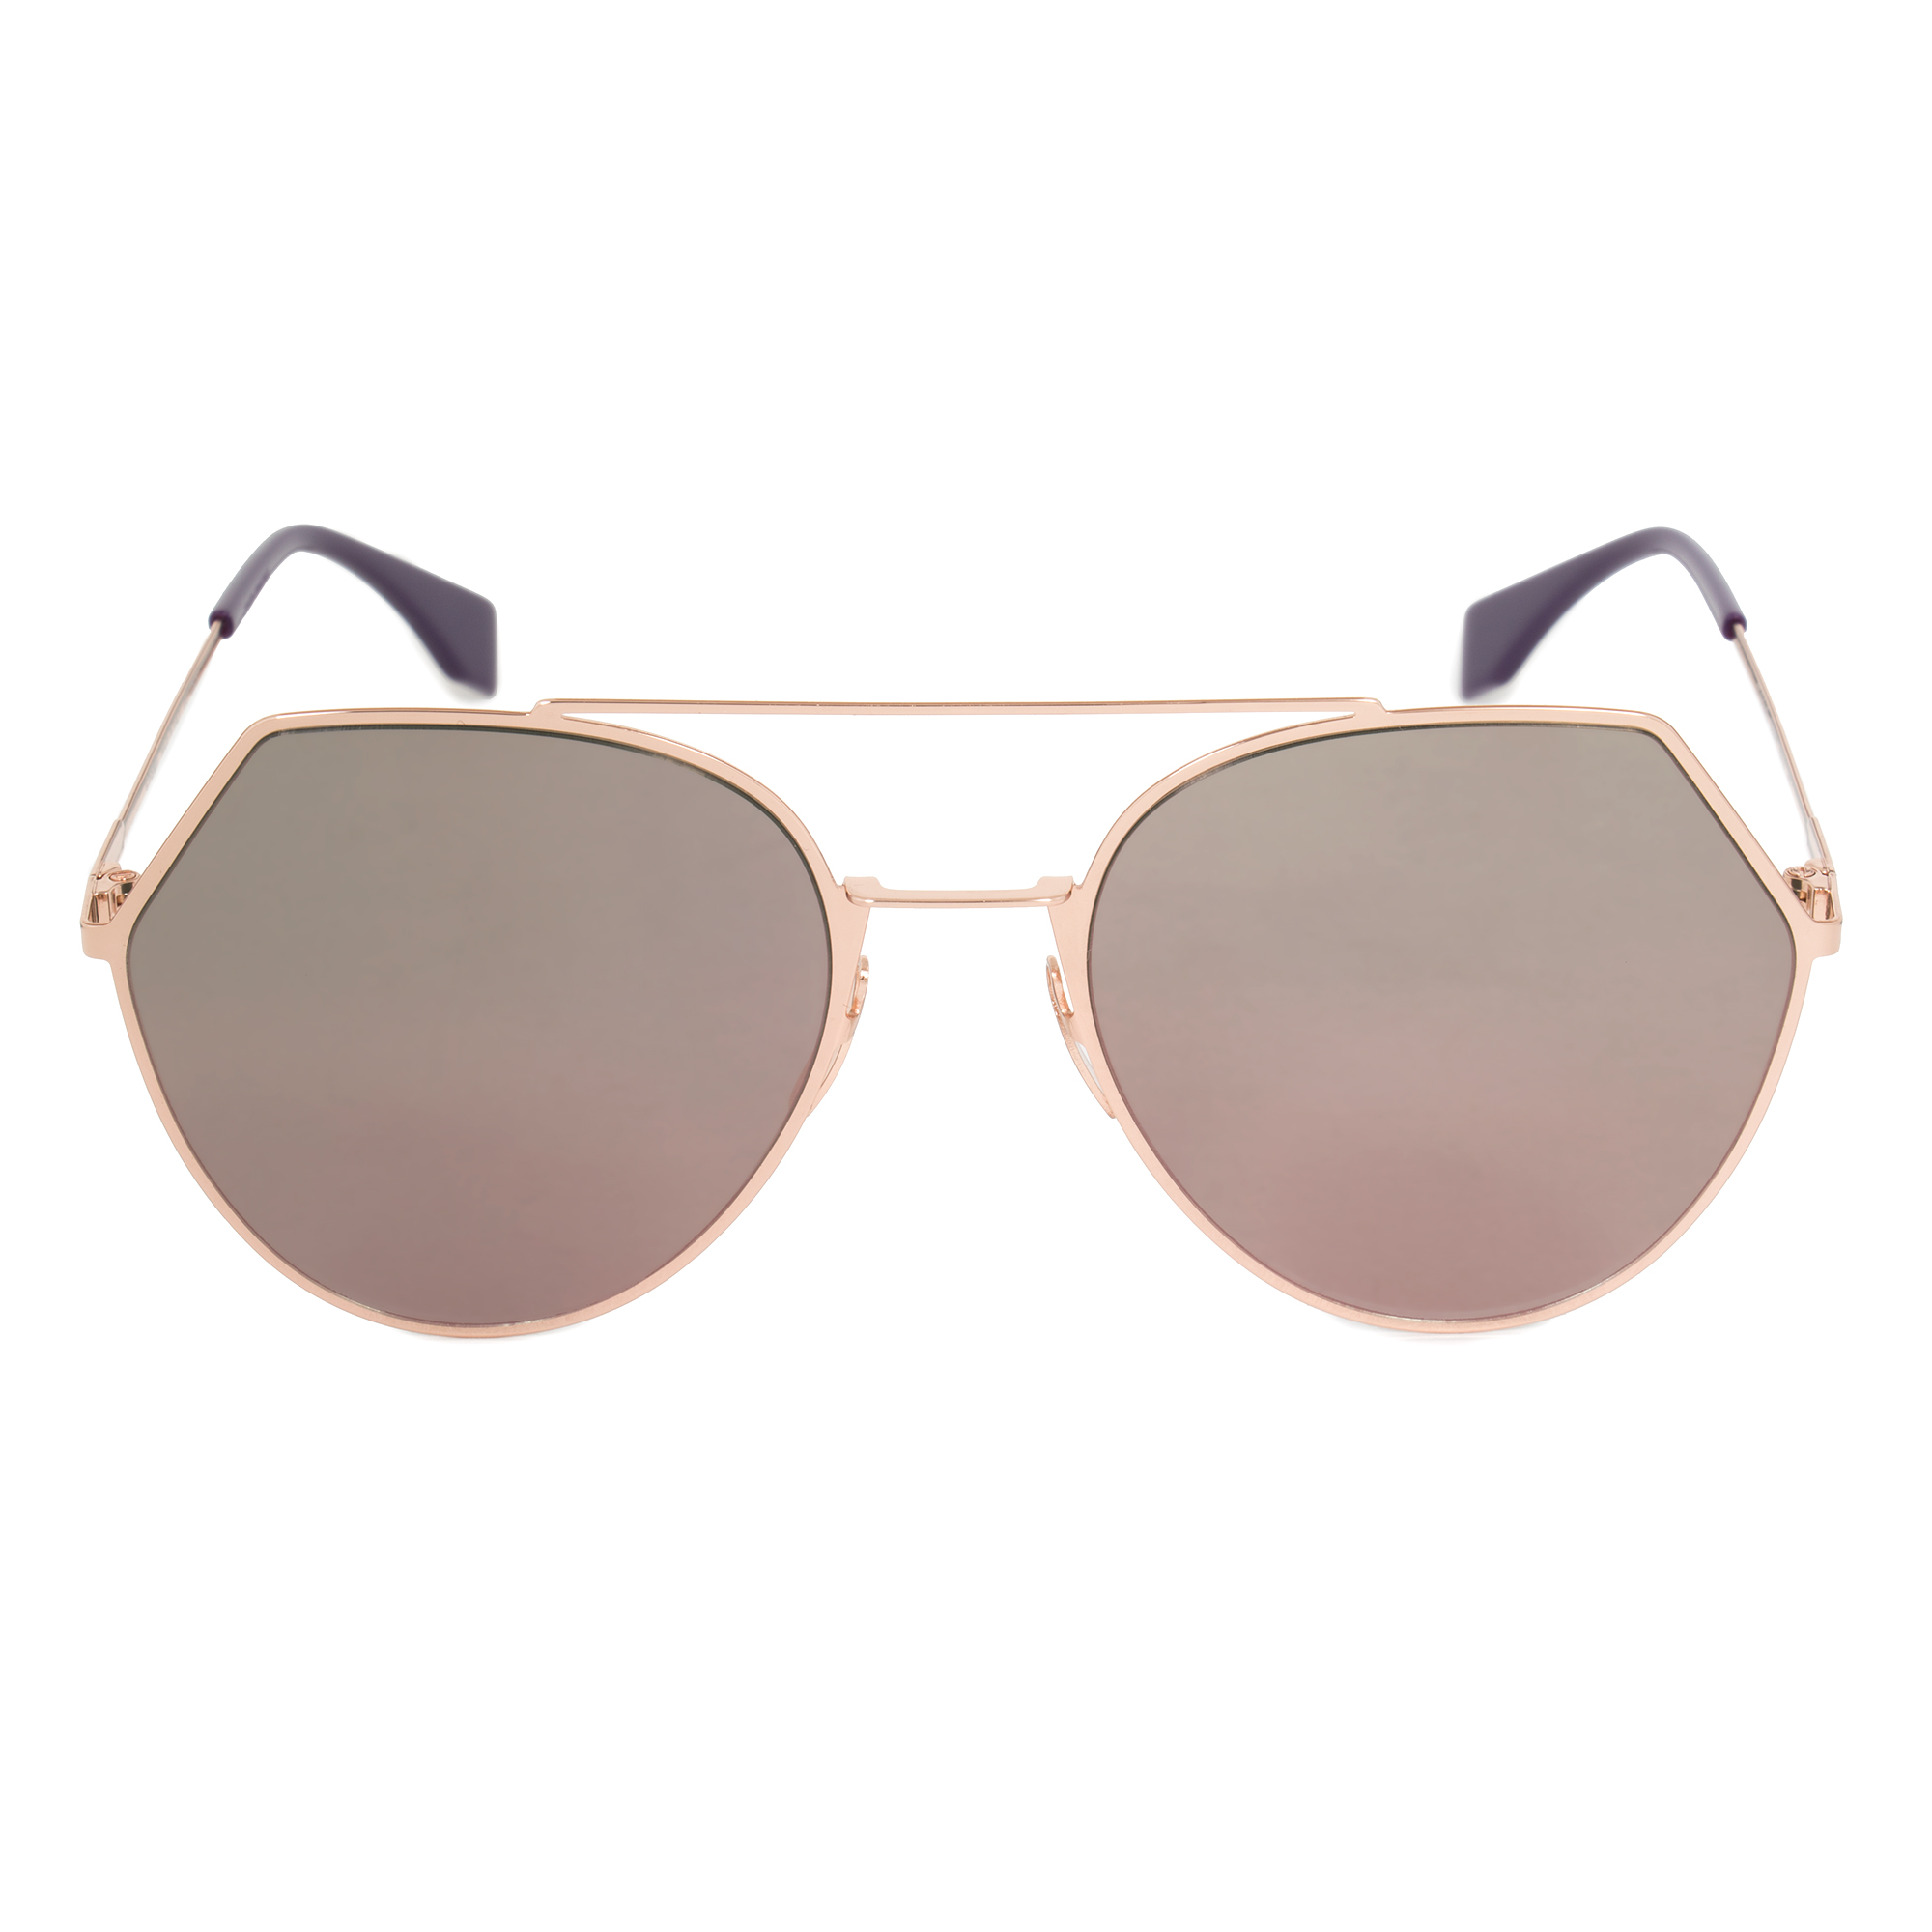 91d4ee3734b56 Fendi FF0194 S DDBAP Sunglasses